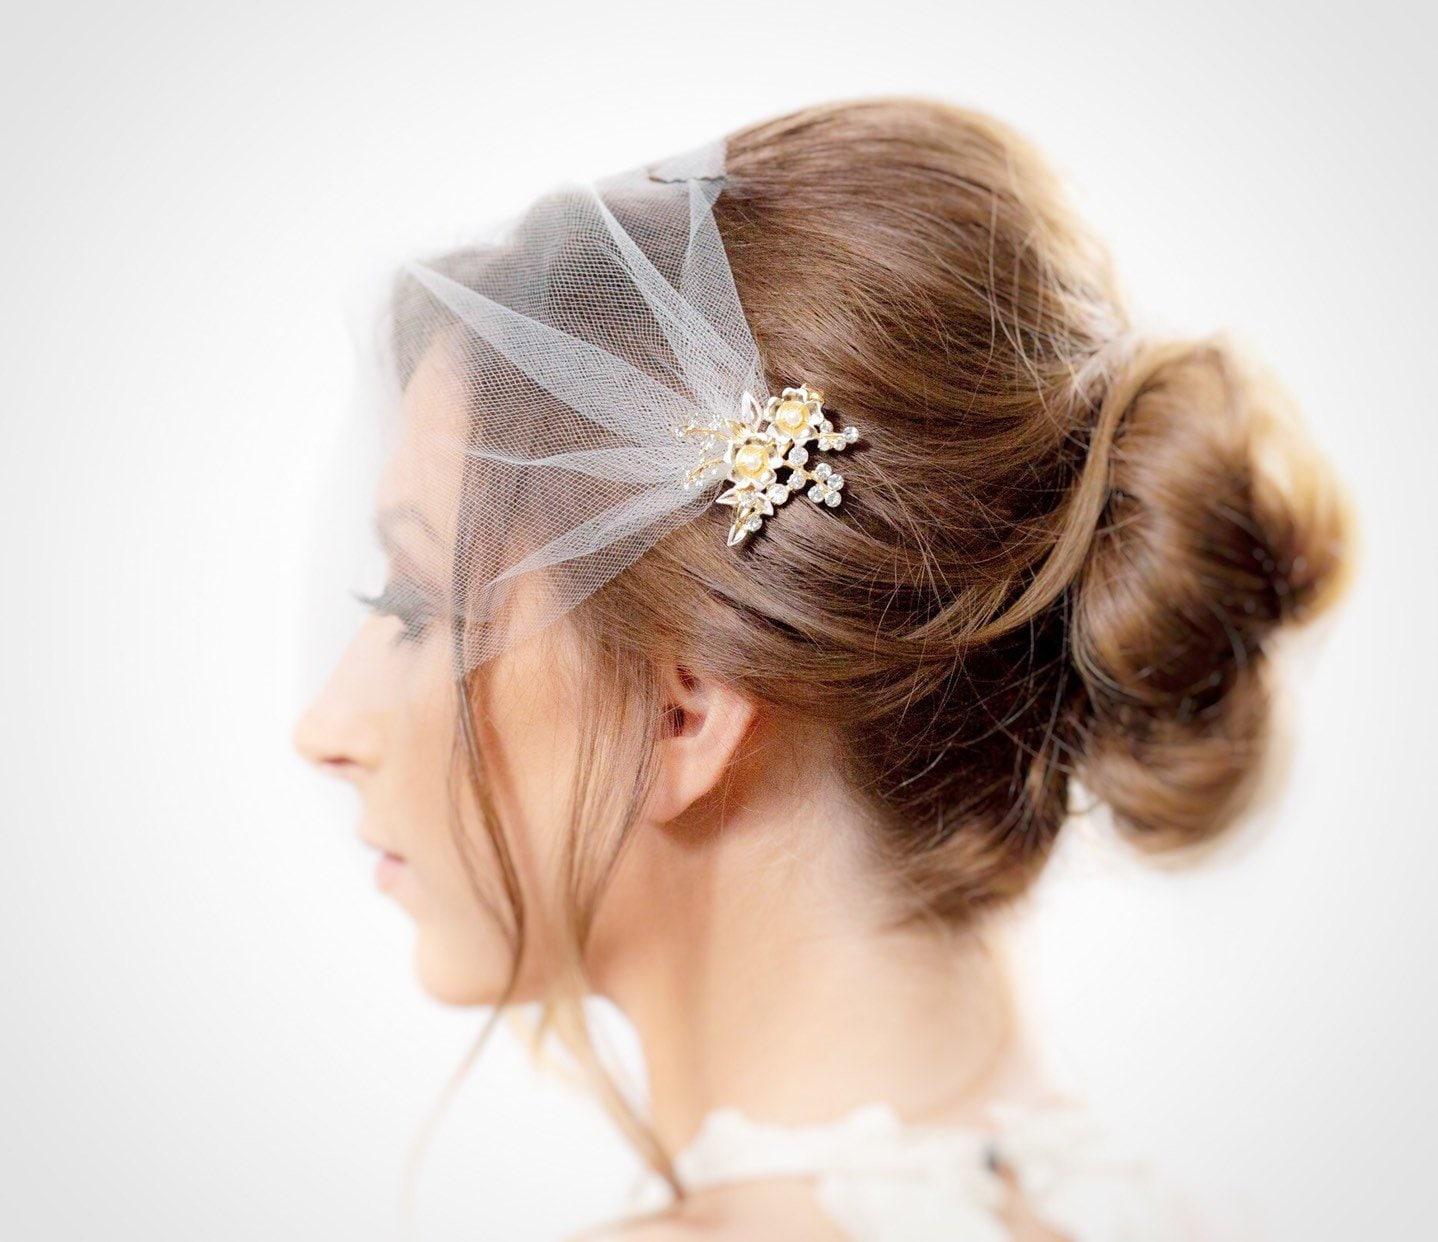 acb8abc3 Ivory Birdcage Veil Wedding Veil blusher veil bridal veil | Etsy